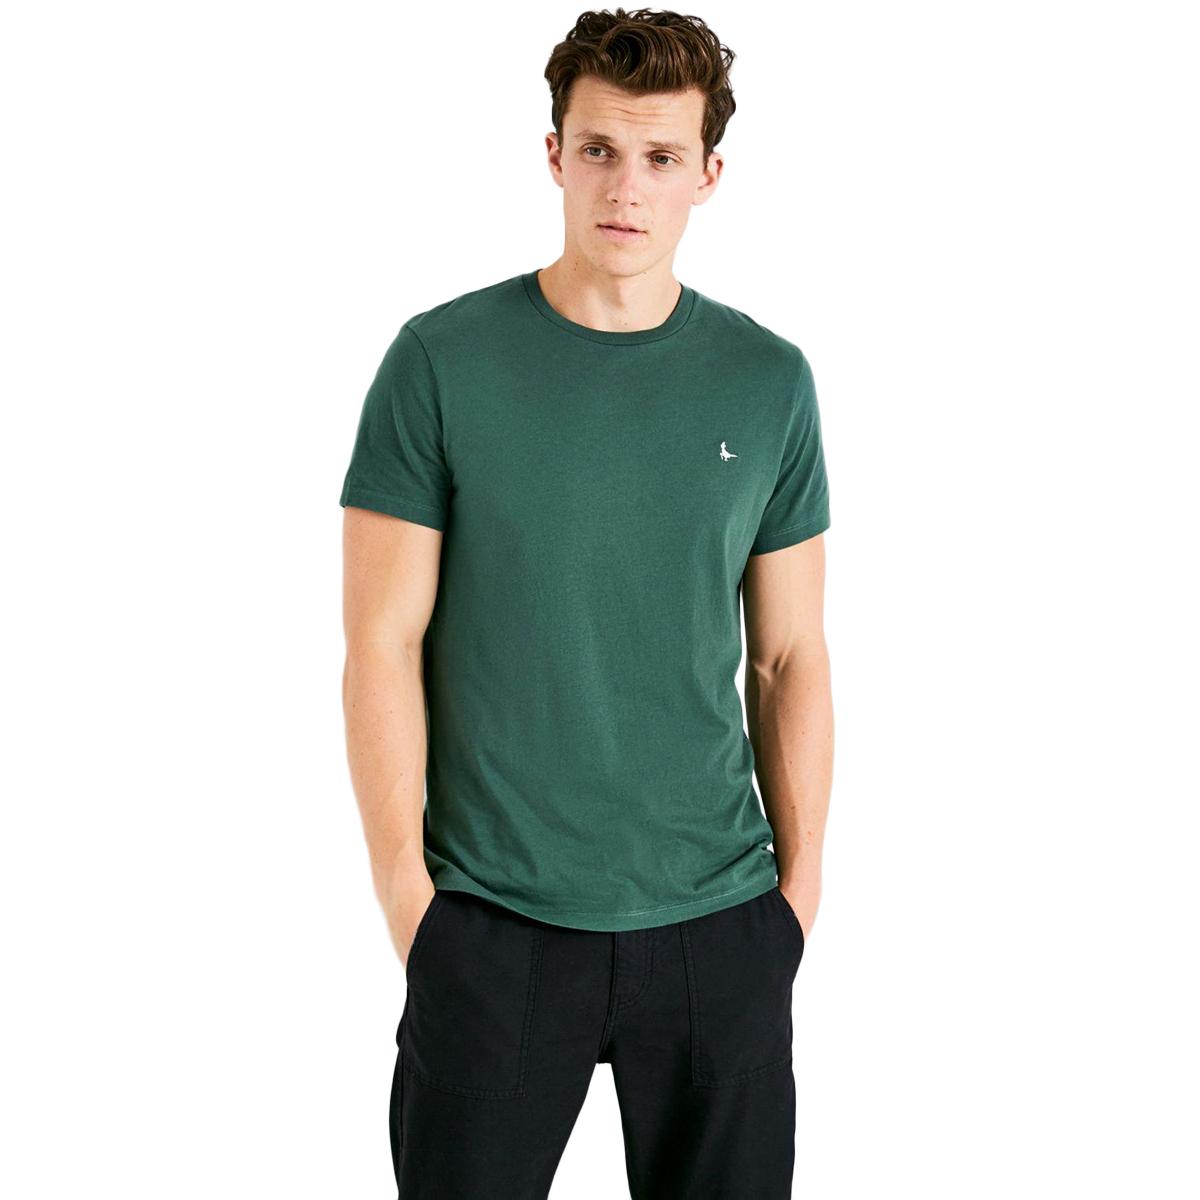 Jack Wills Men's Sandleford Short-Sleeve Tee - Green, M